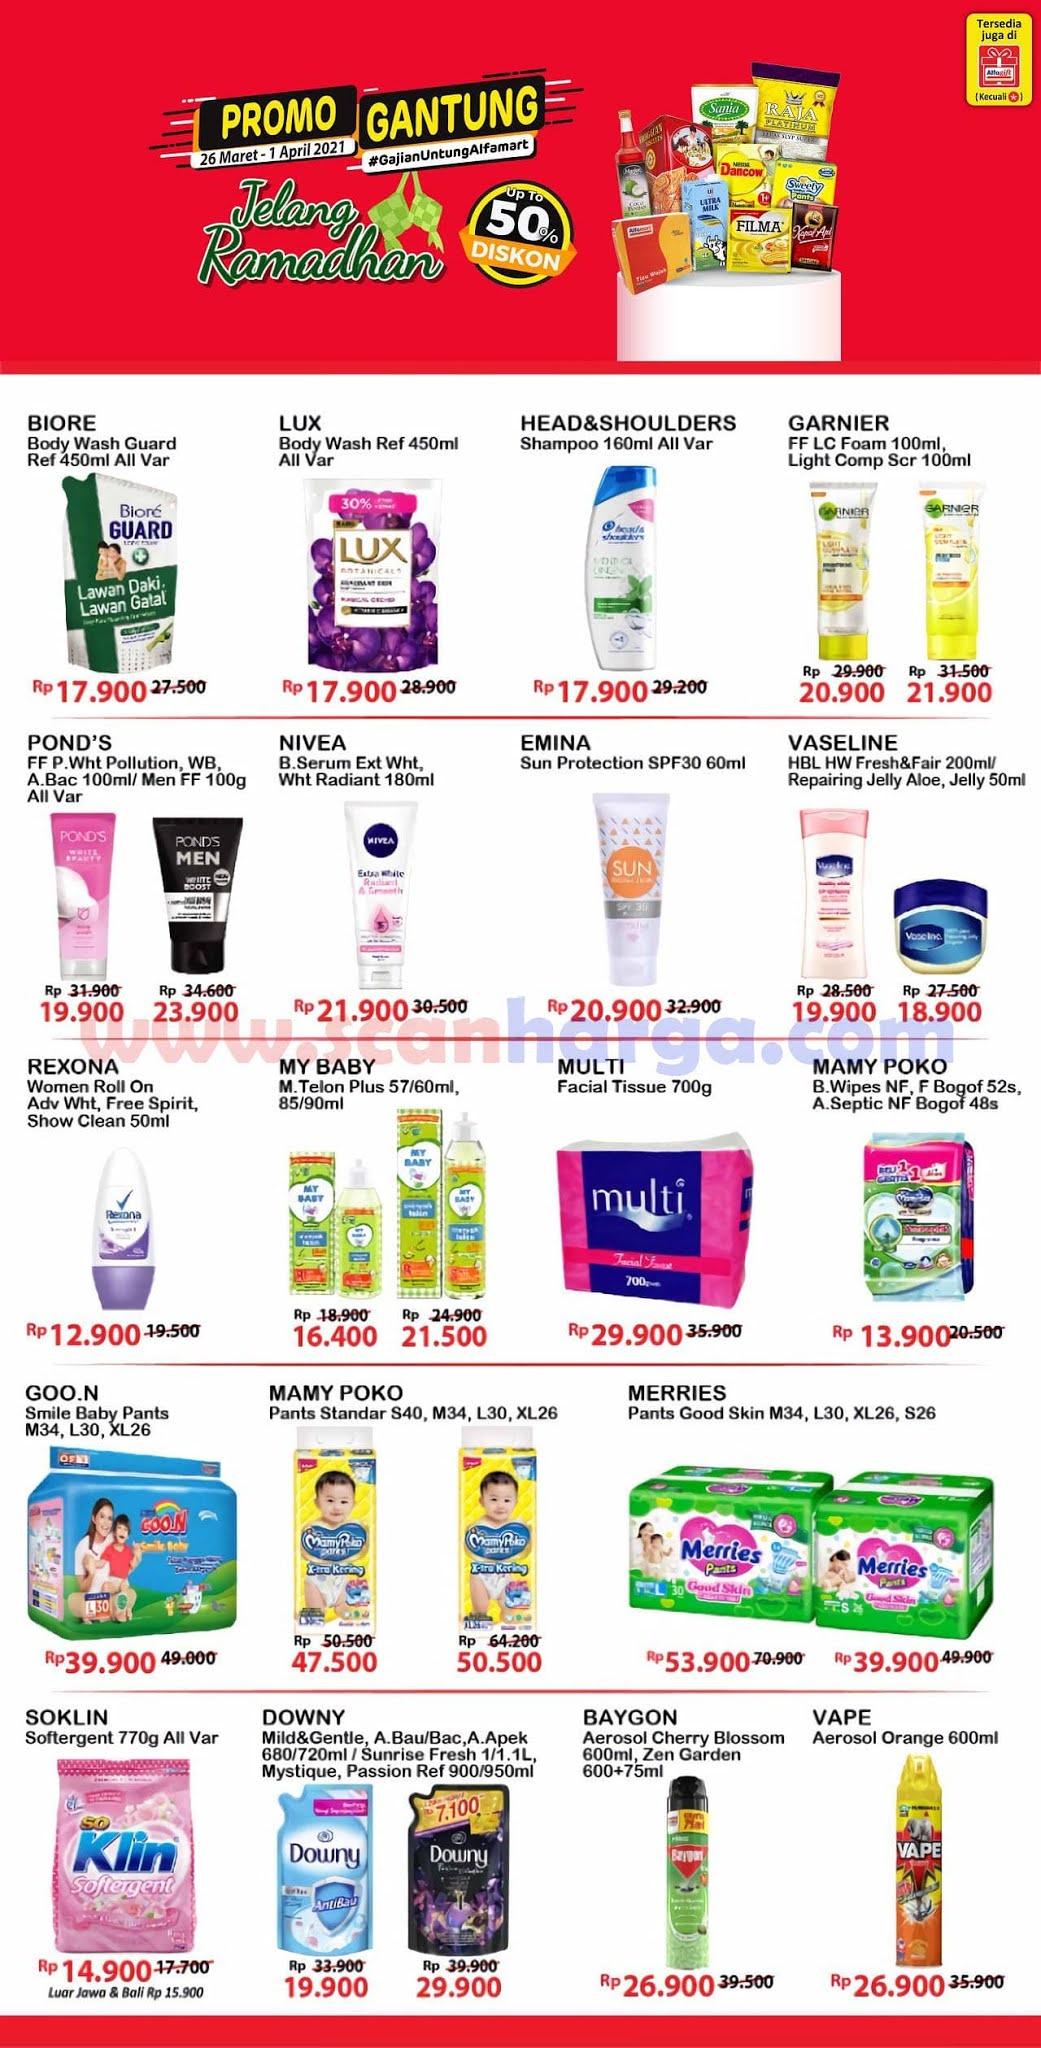 Katalog Promo Alfamart Gajian Untung (Gantung) 26 Maret - 1 April 2021 4